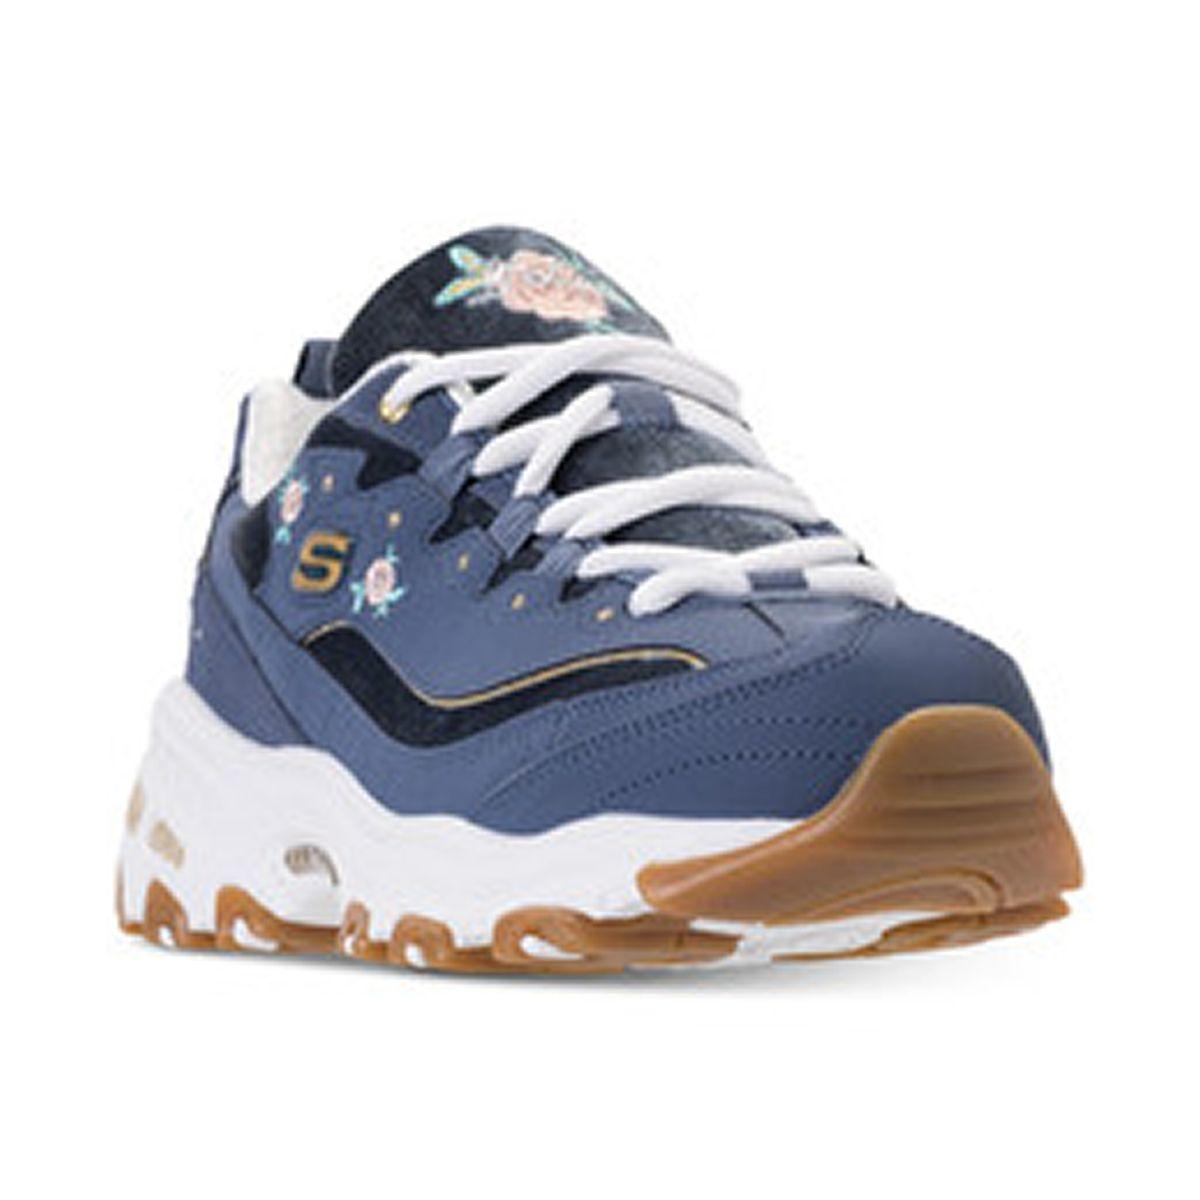 2e551e9fda4 Finish Line Athletic Shoes - Macy s